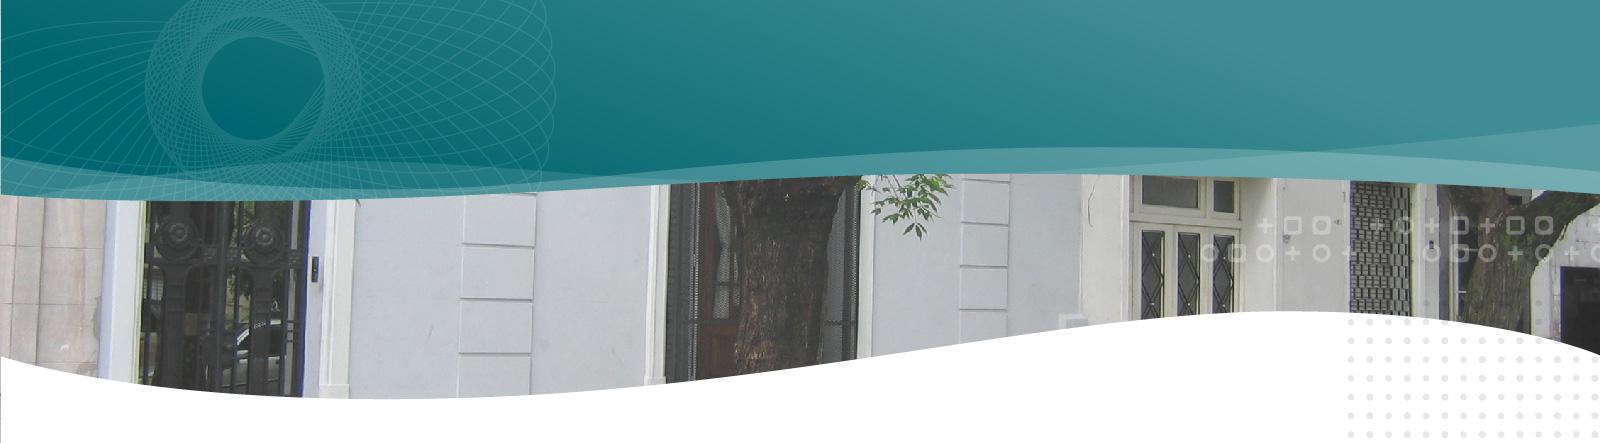 Oficinas ICL